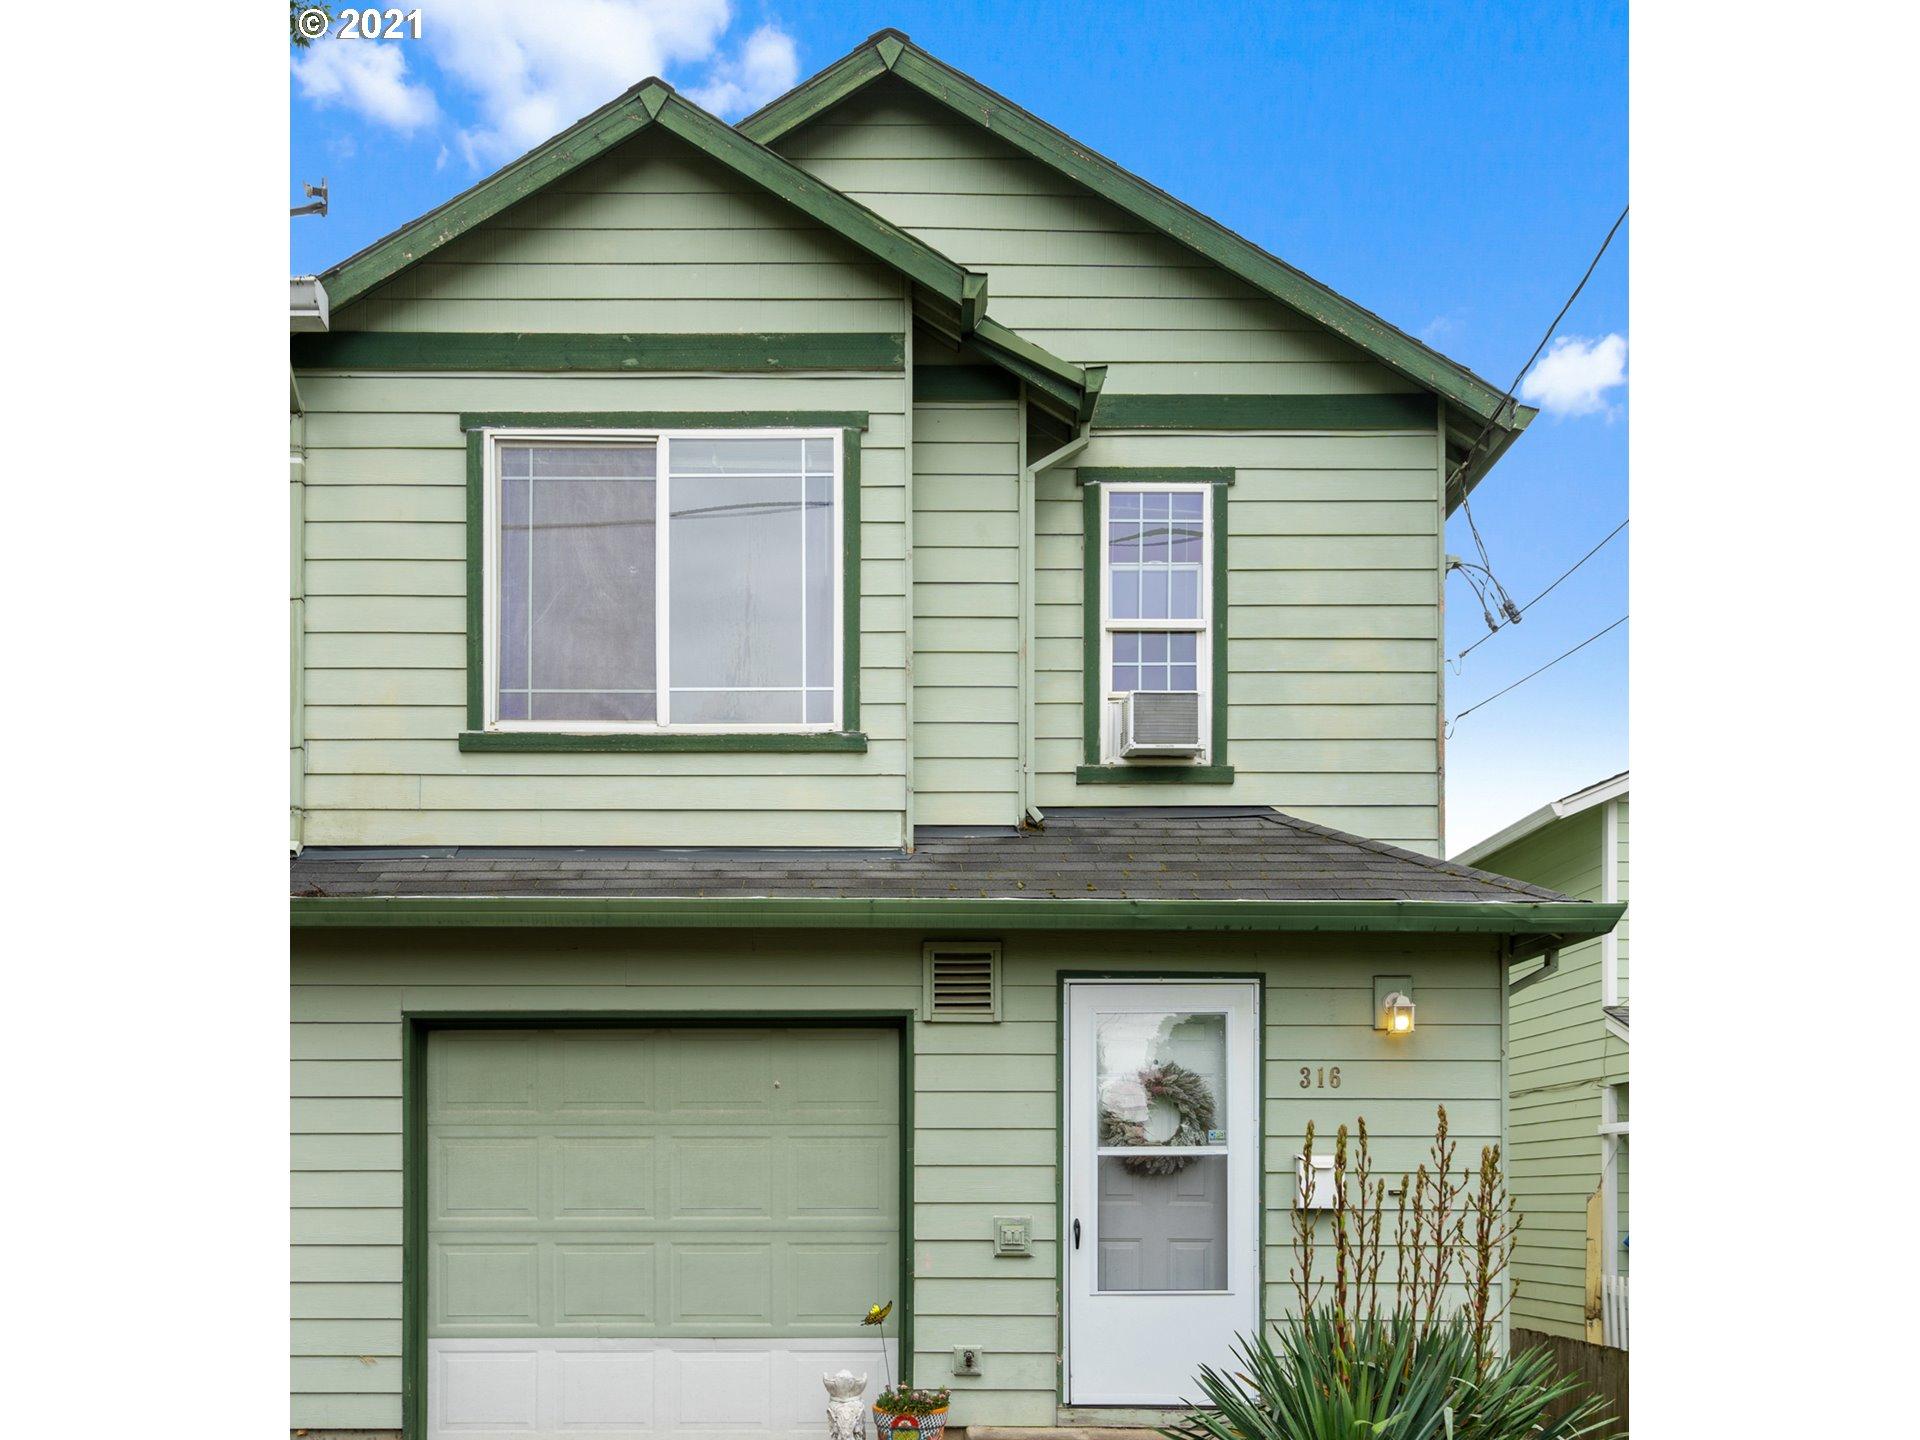 316 SE 88TH AVE, Portland OR 97216